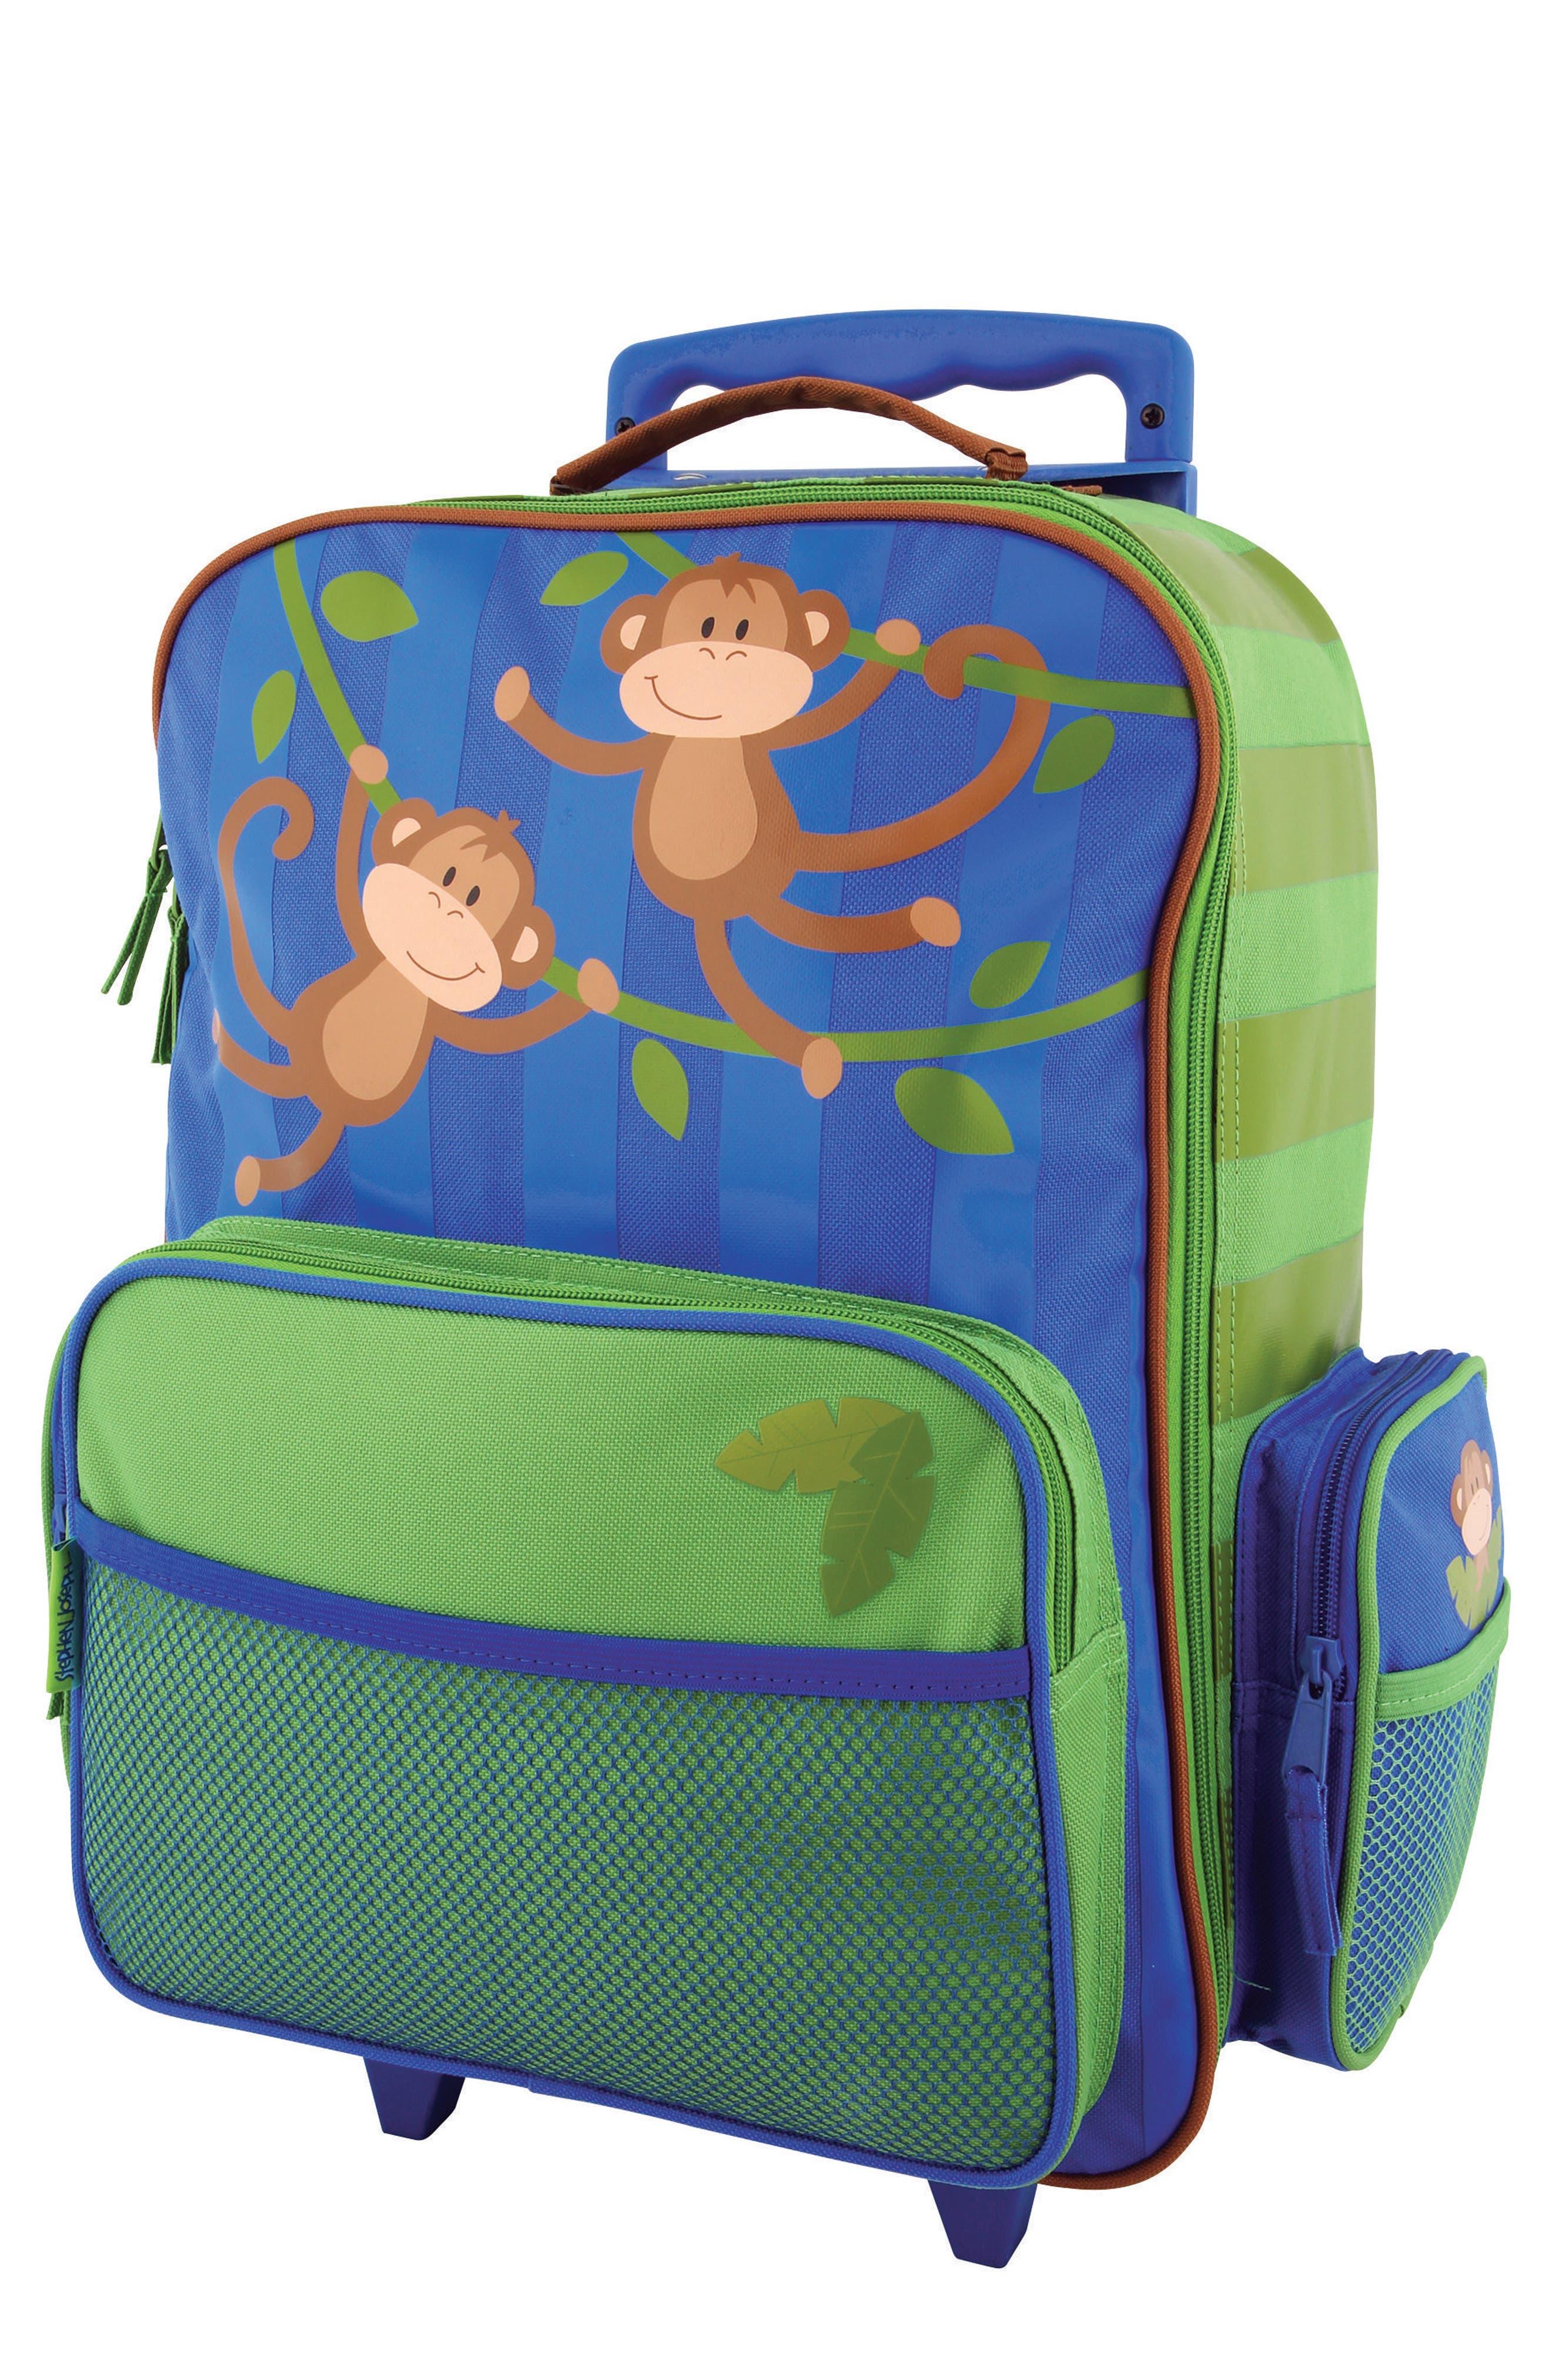 Stephen Joseph 'ELP' Rolling Suitcase (Kids)